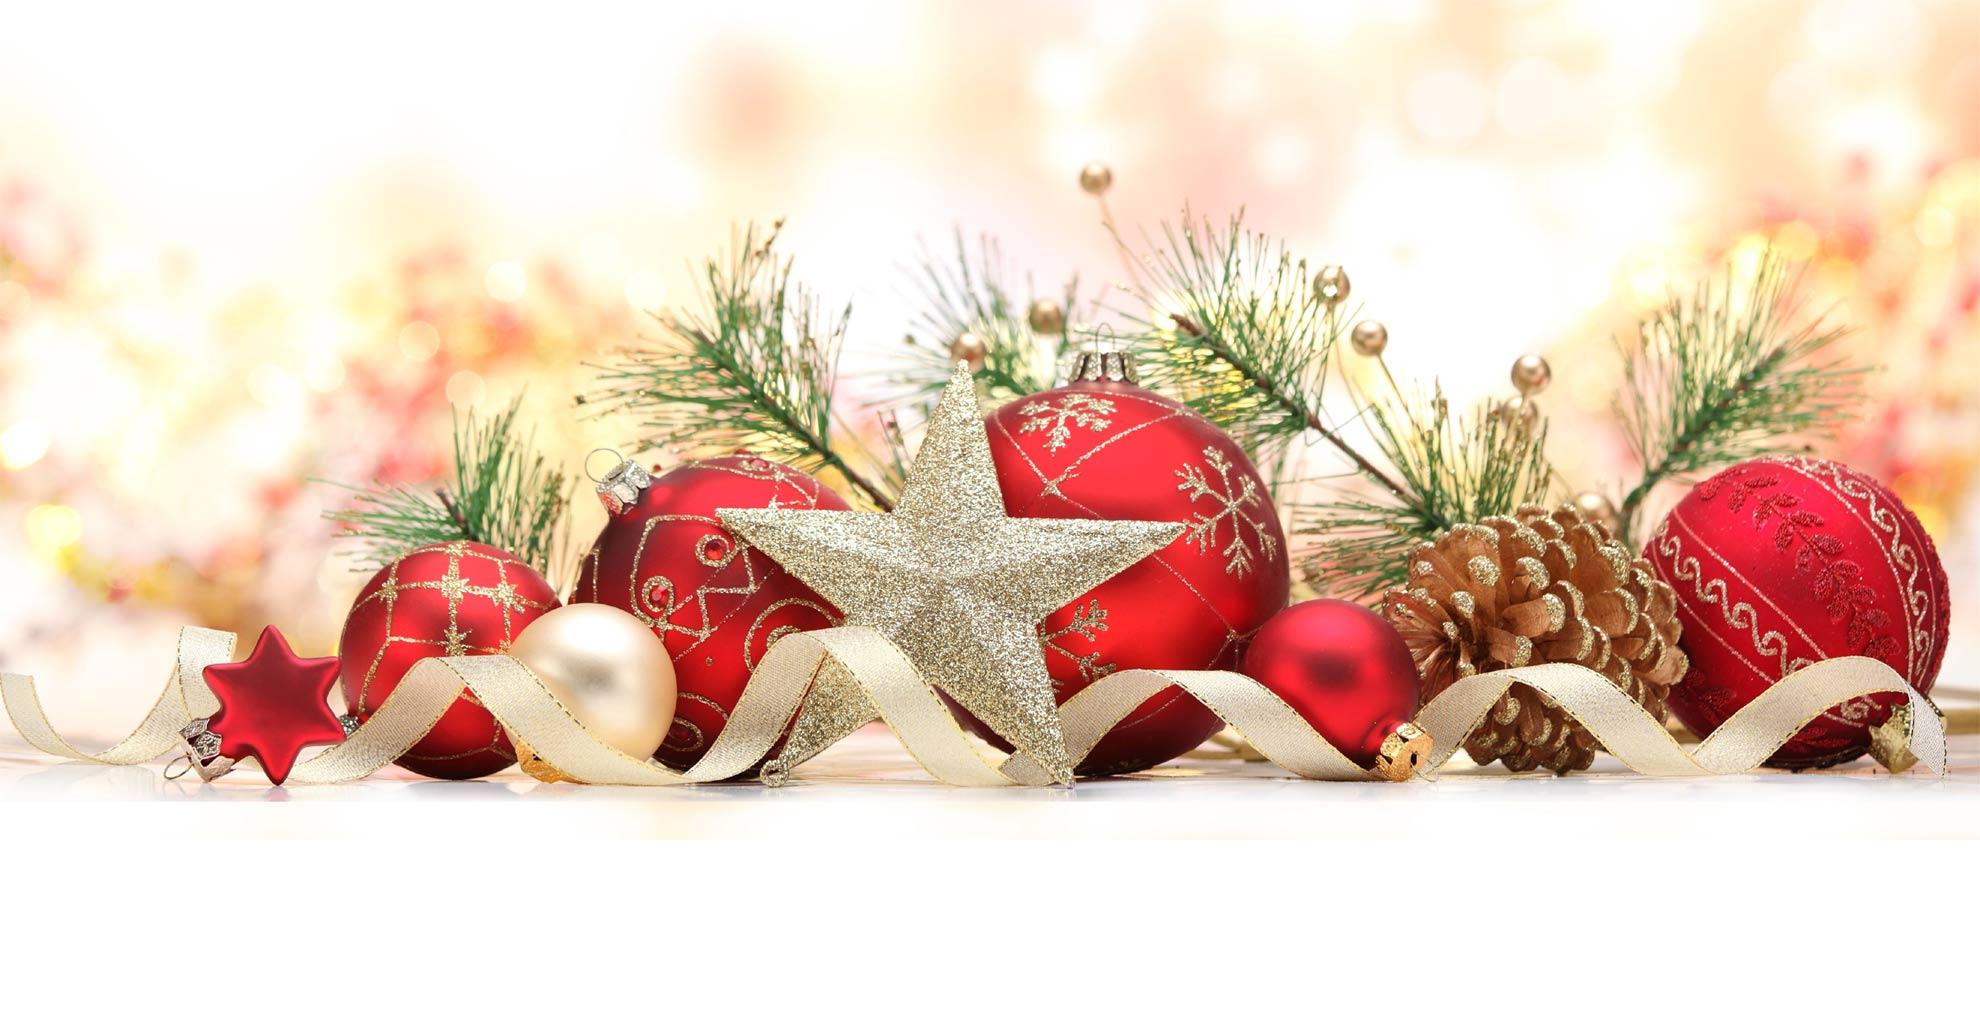 Sfondi Natale - Sfondo Palline Natalizie